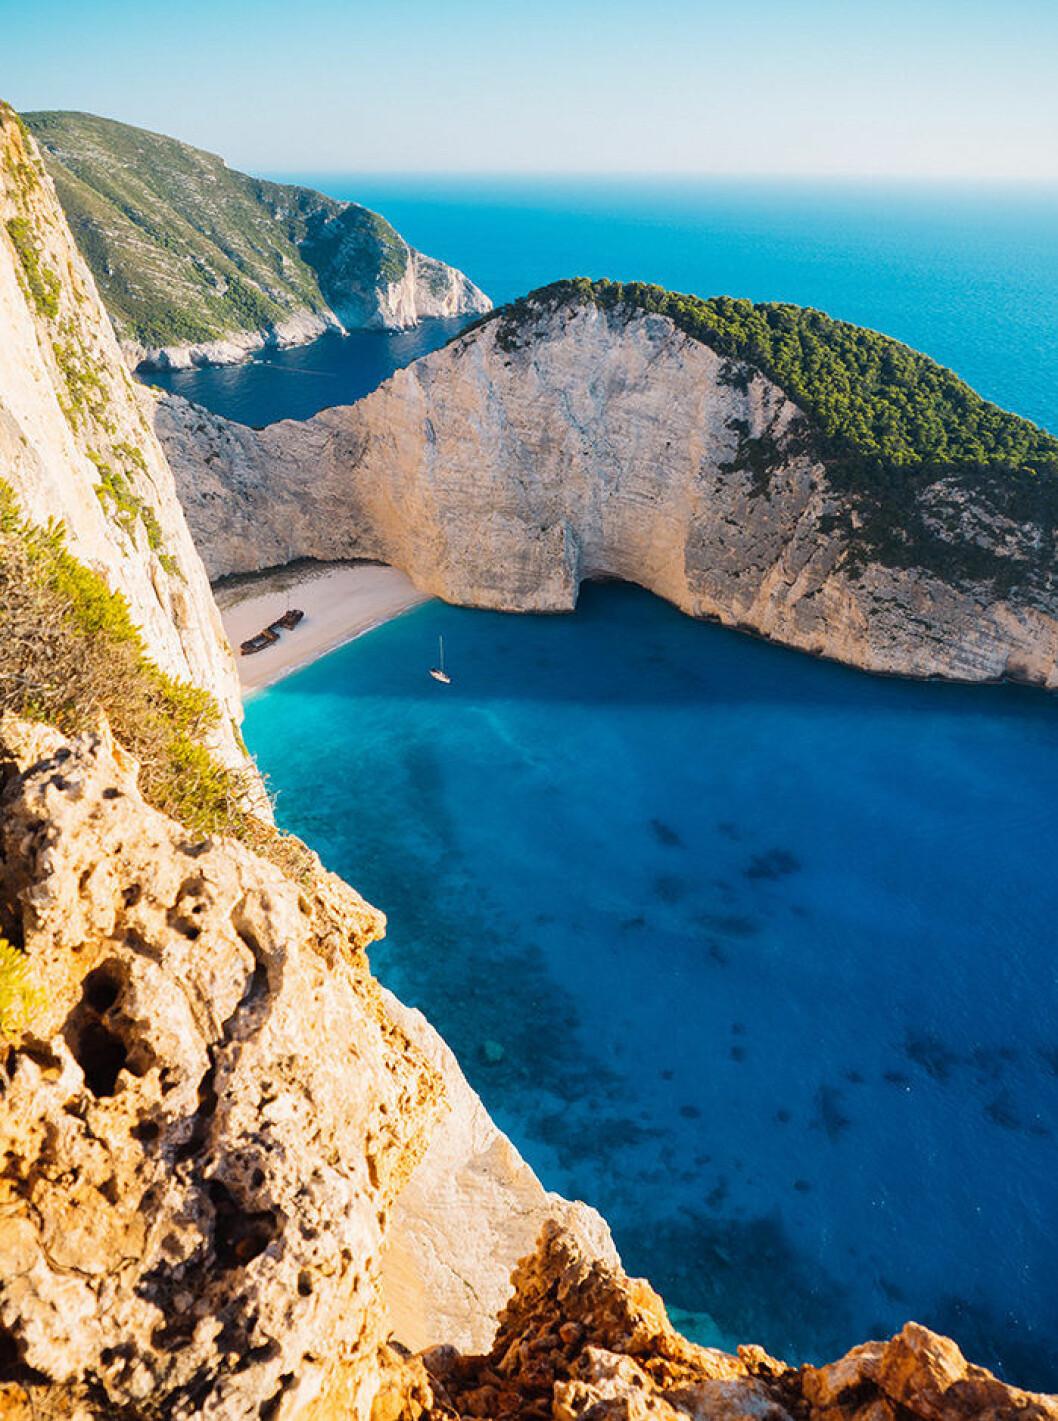 Navagio Beach i Grekland lockar många turister